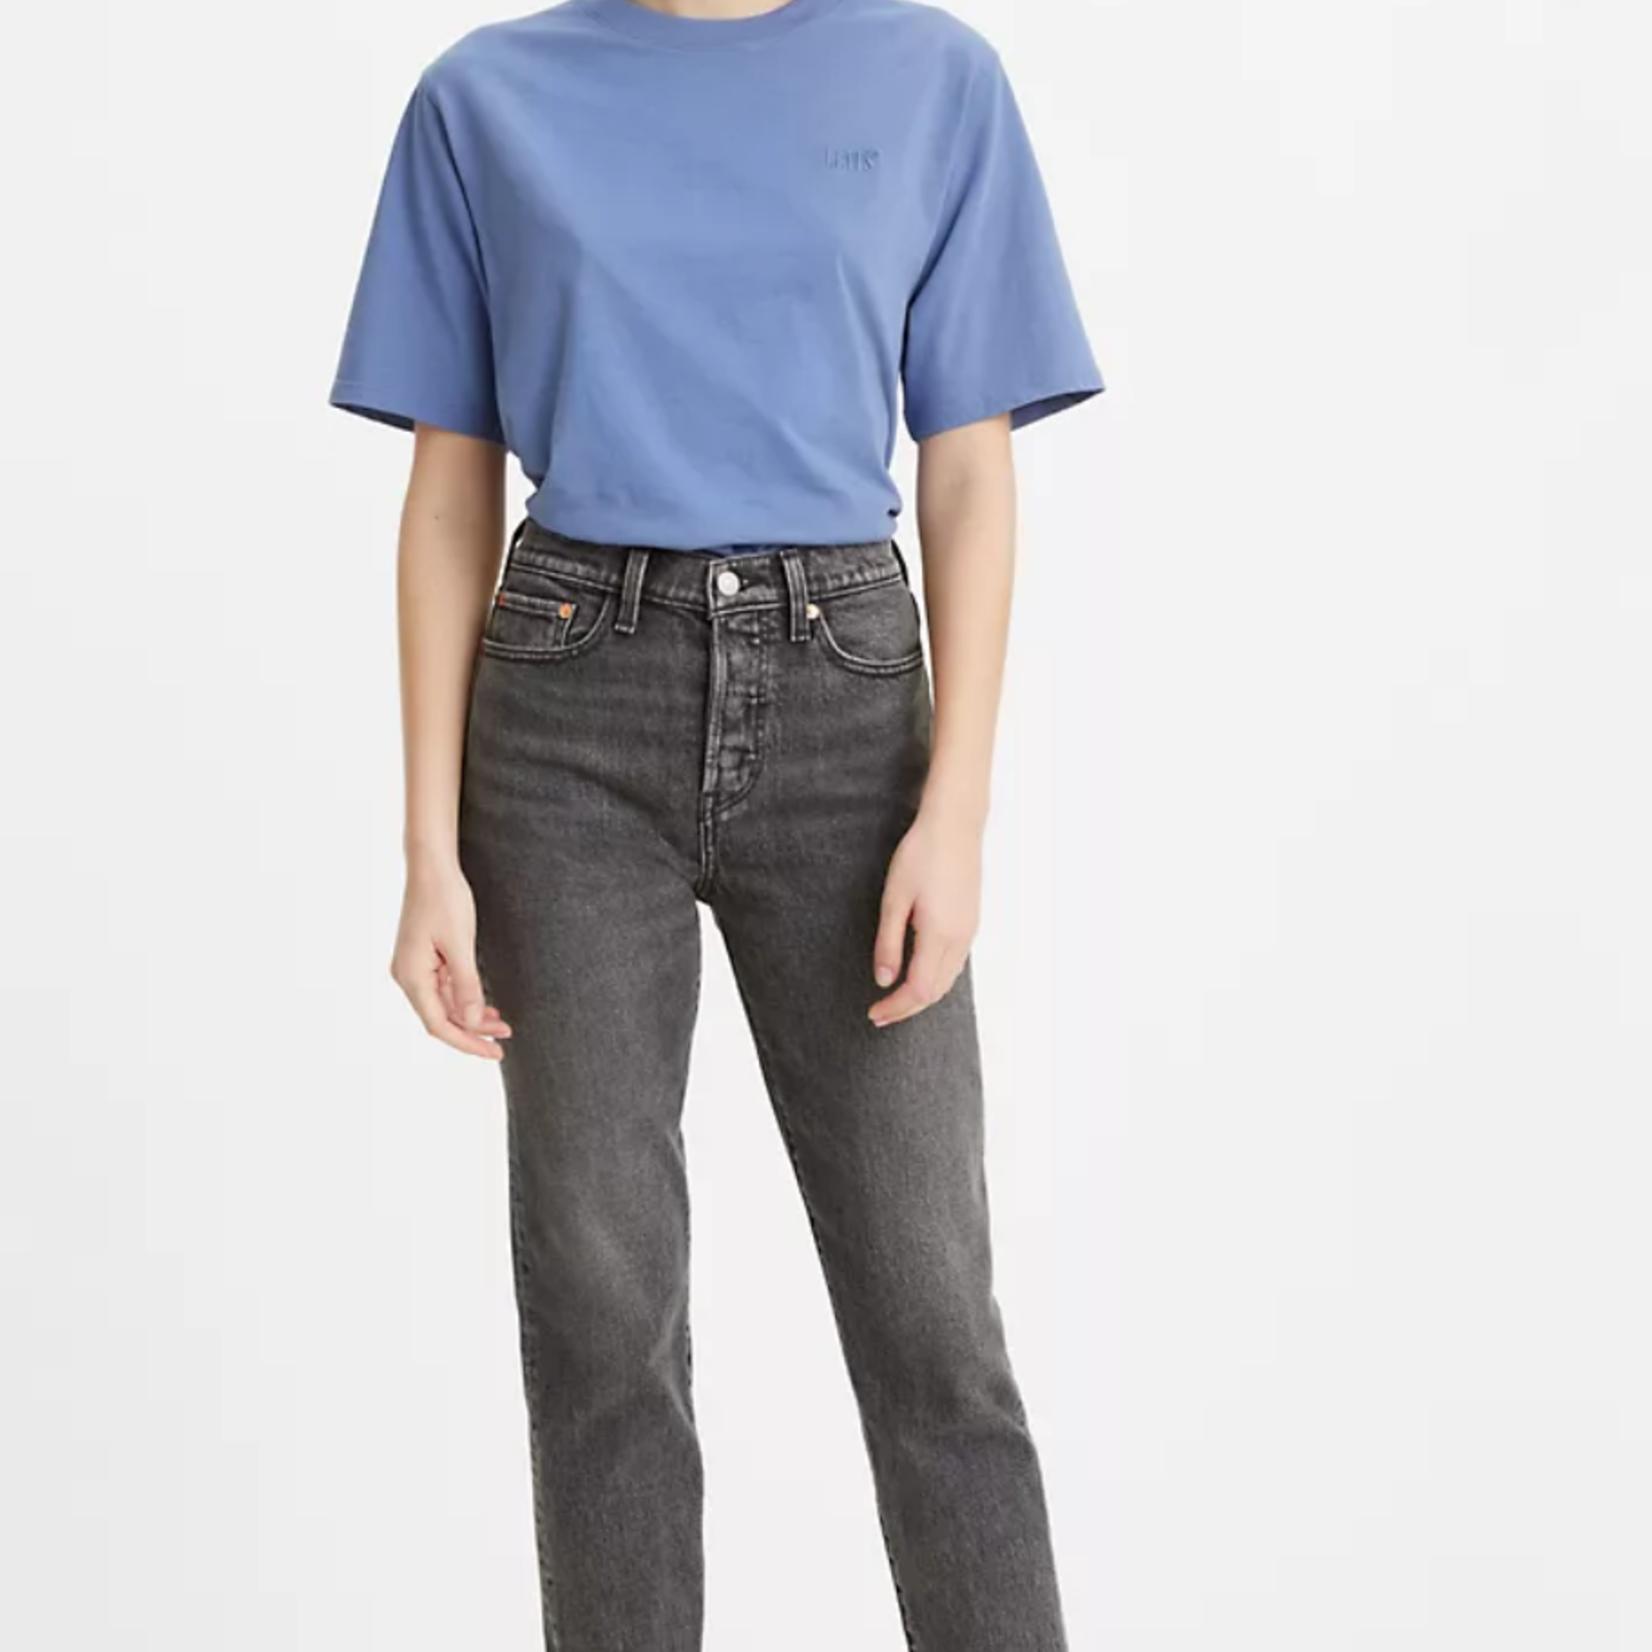 levi's - wedgie fit jeans